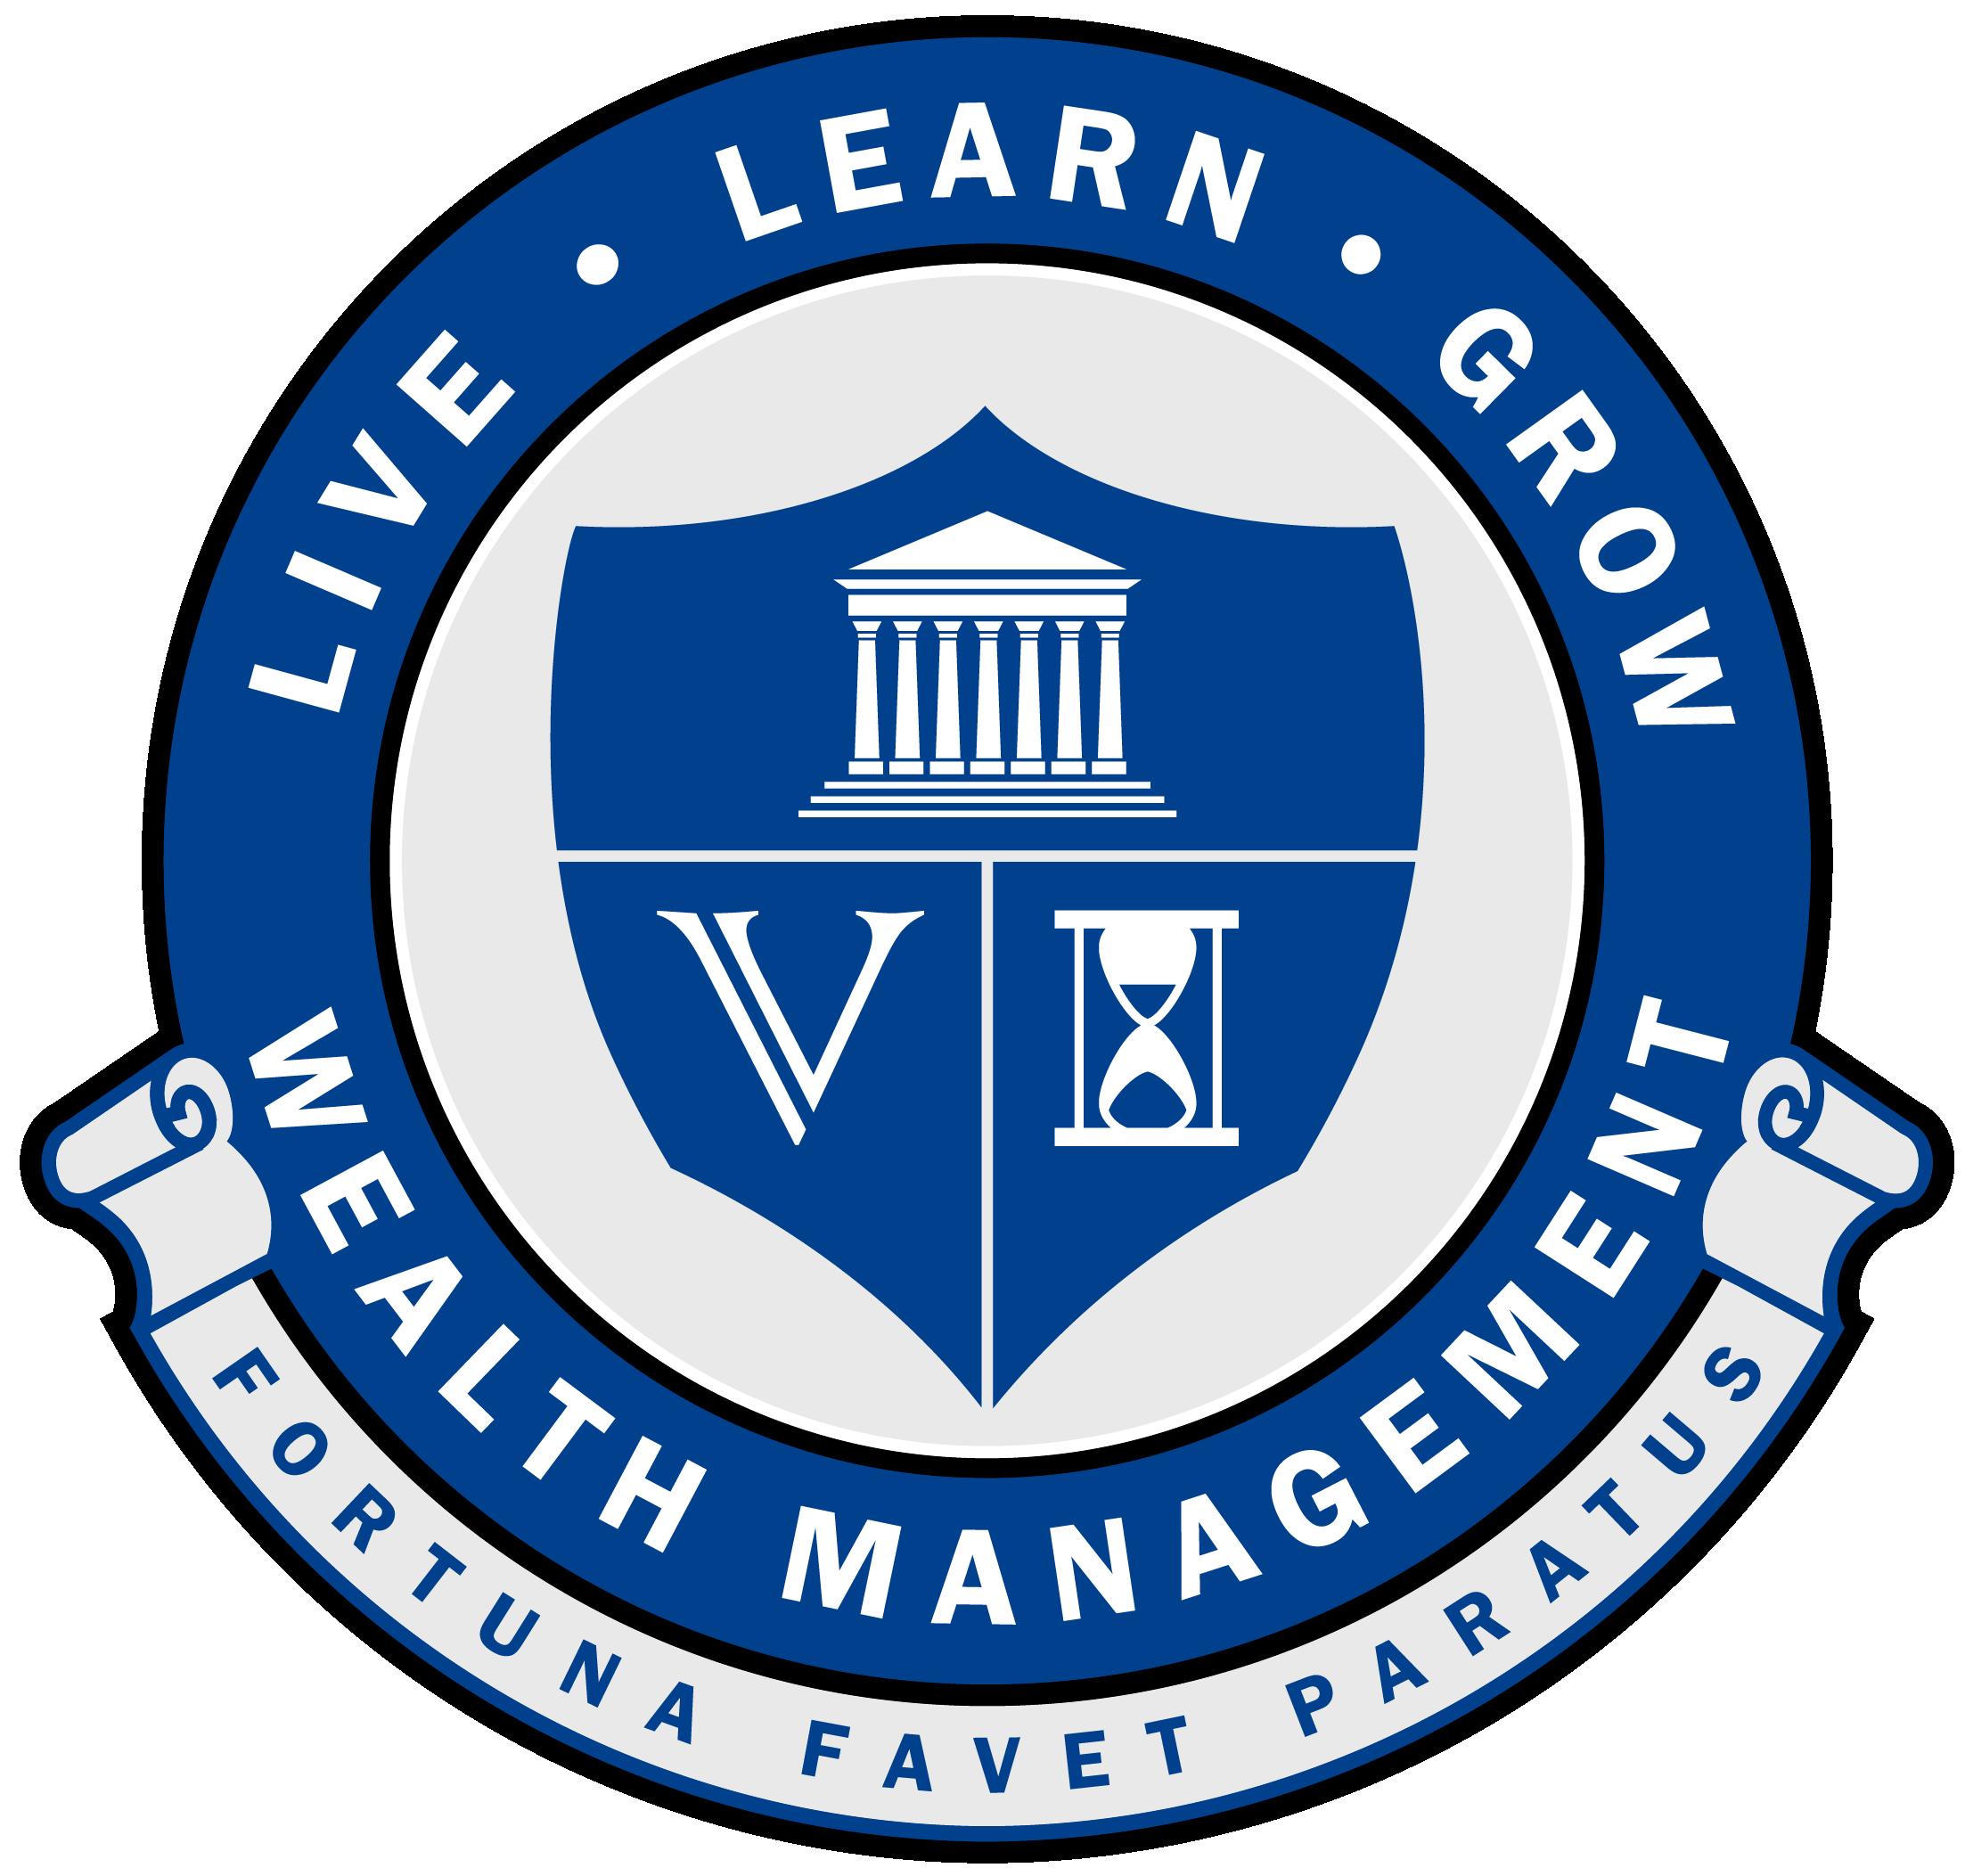 LLG Wealth Management